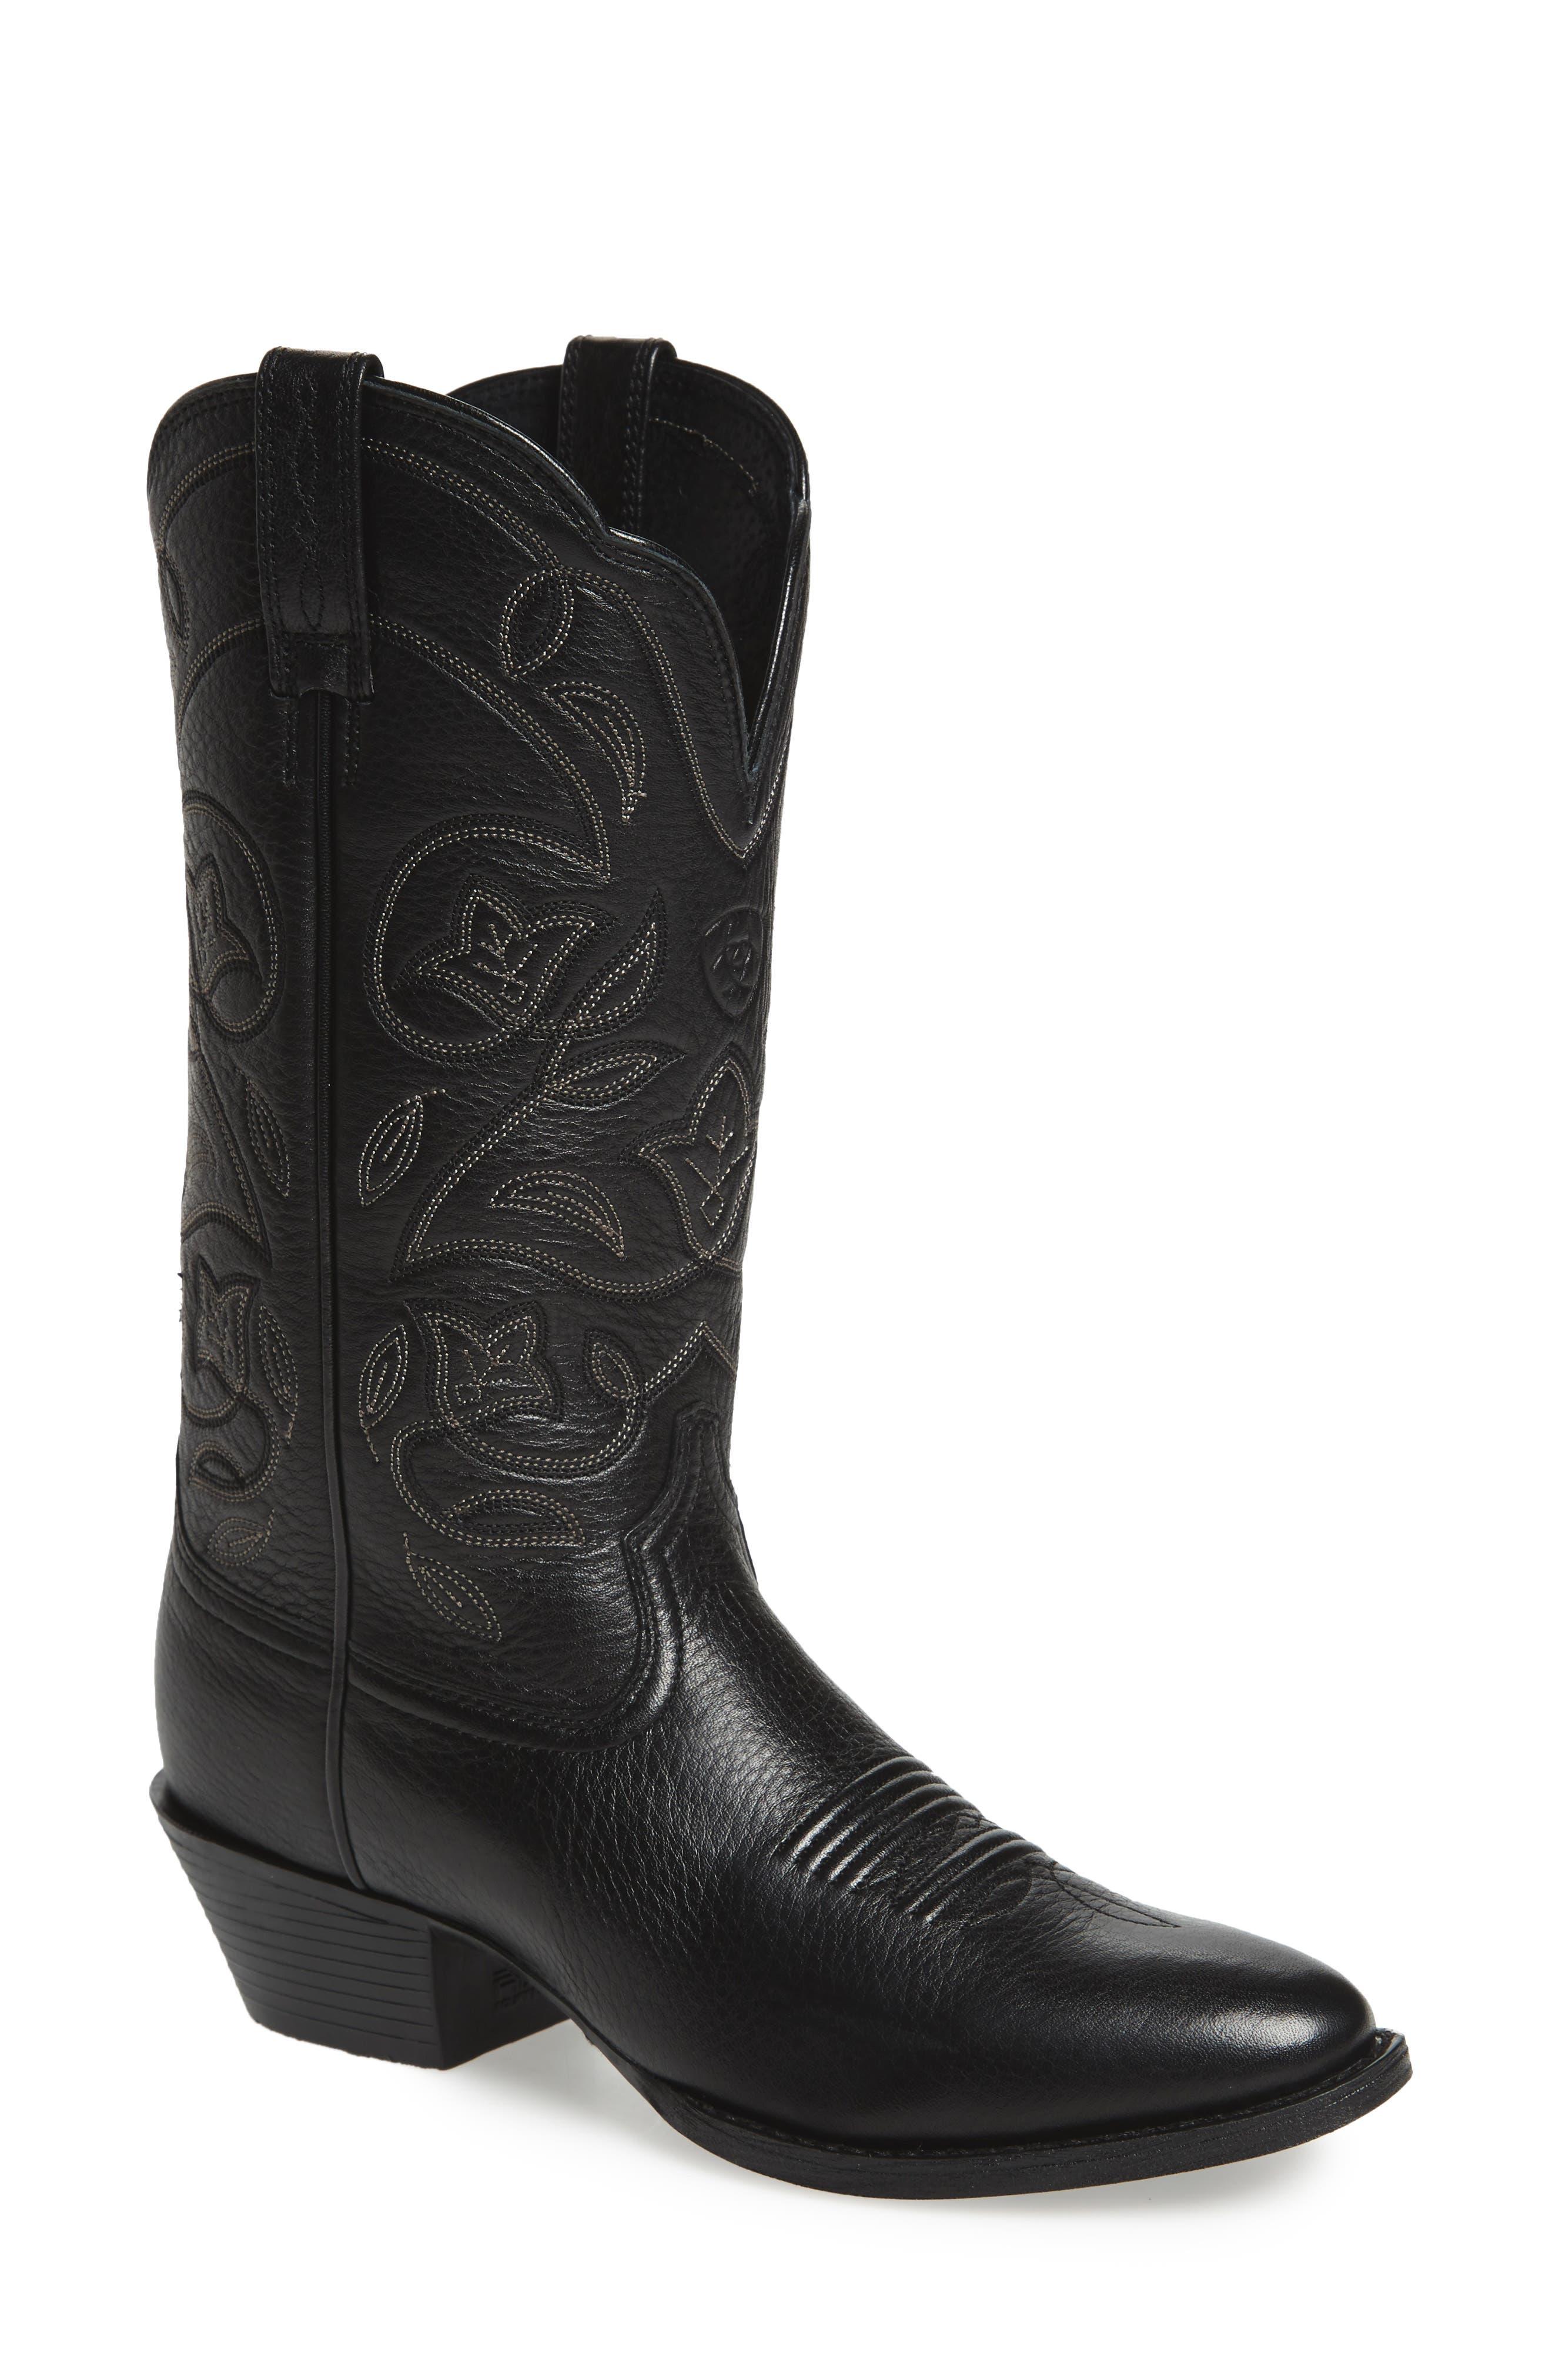 Ariat Heritage Western R-Toe Boot, Black